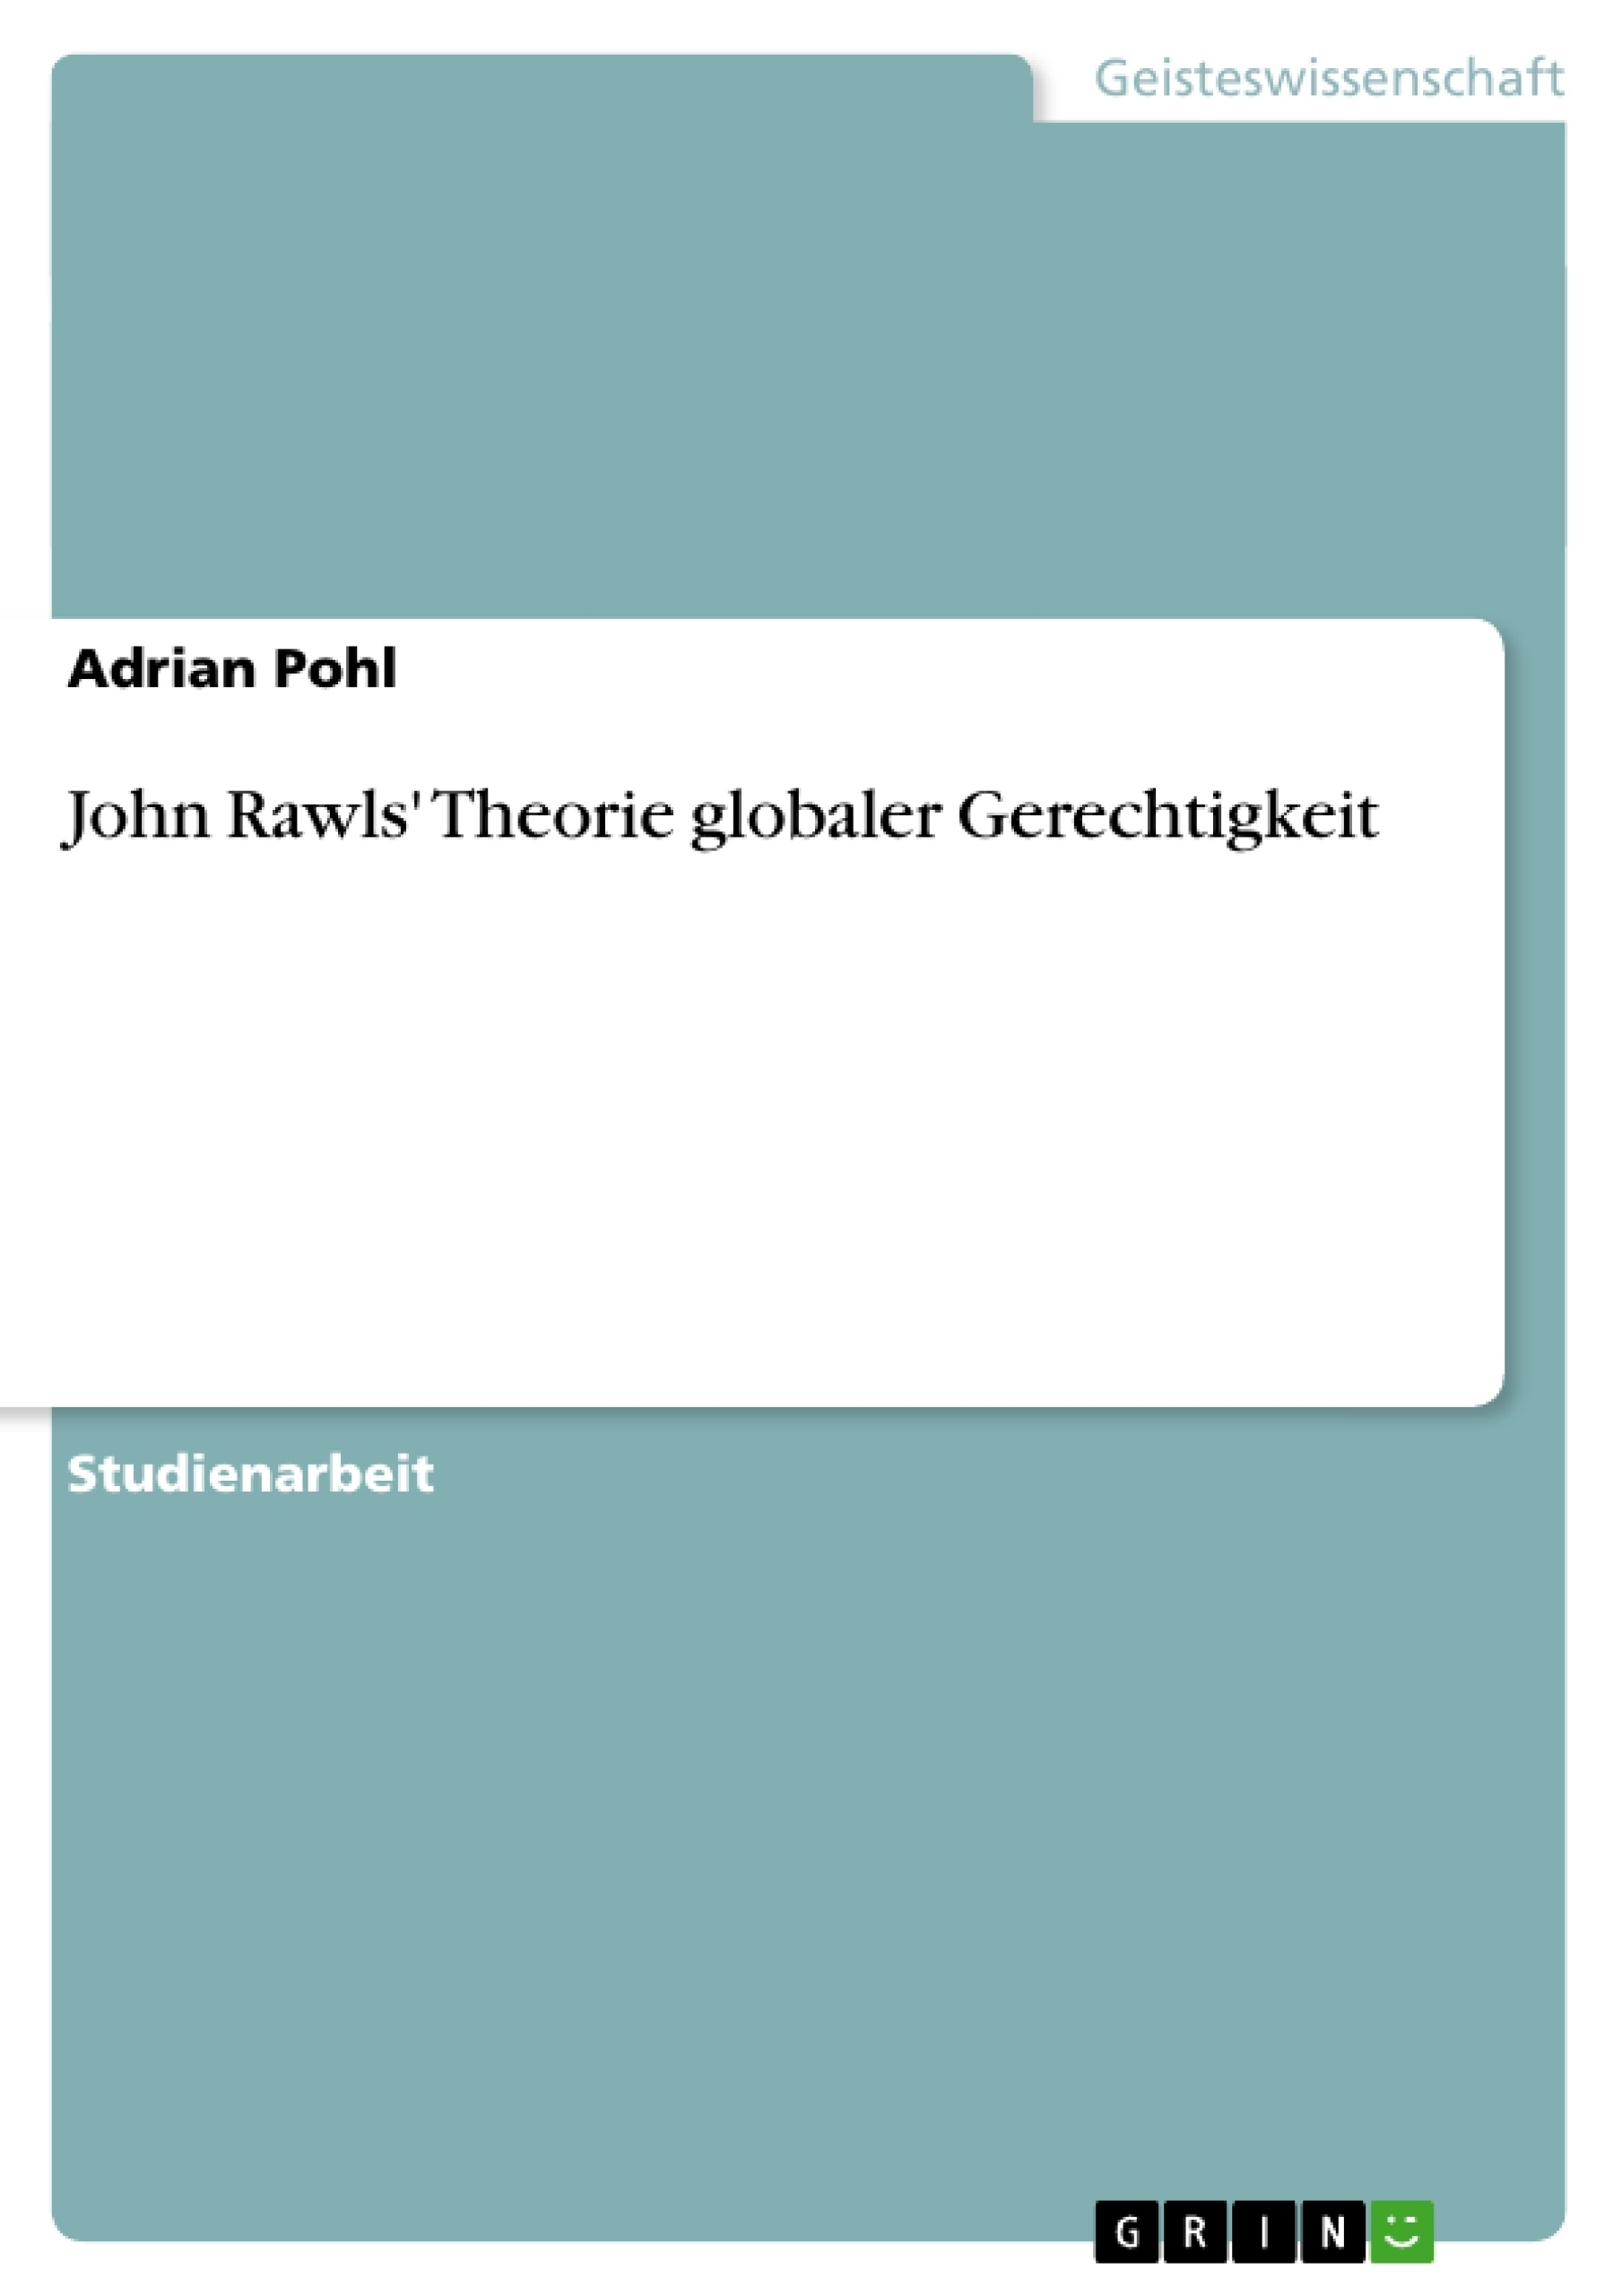 Titel: John Rawls' Theorie globaler Gerechtigkeit